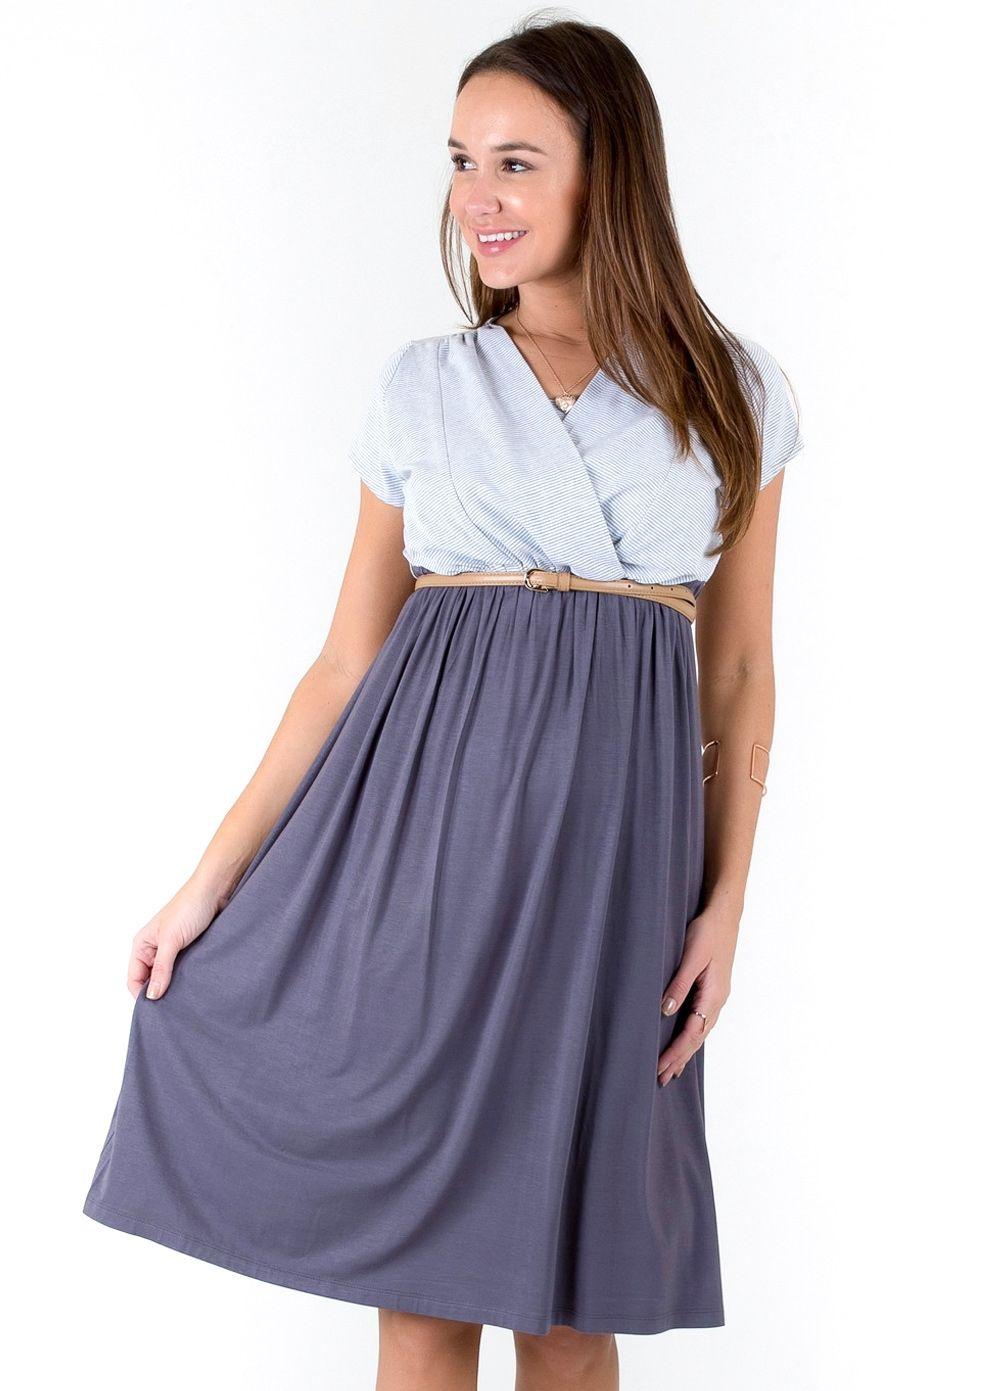 Lait Co Ingres Nursing Dress Nursing Dress Nursing Clothes Breastfeeding Clothes